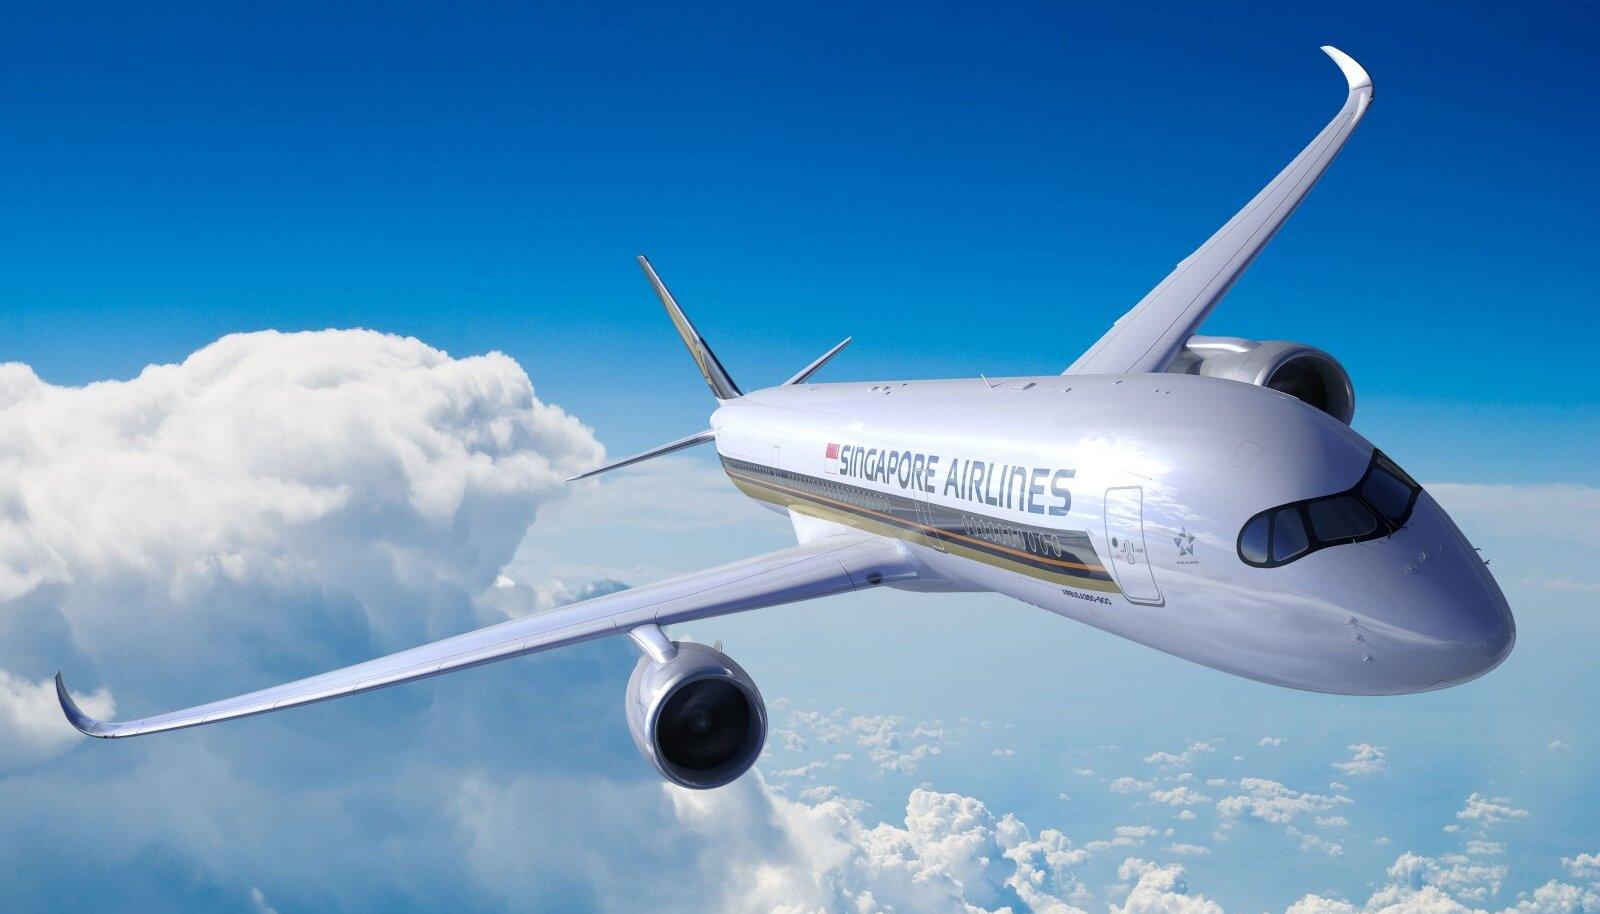 Singapore Airlinesi A350-900ULR Airbus lennuk